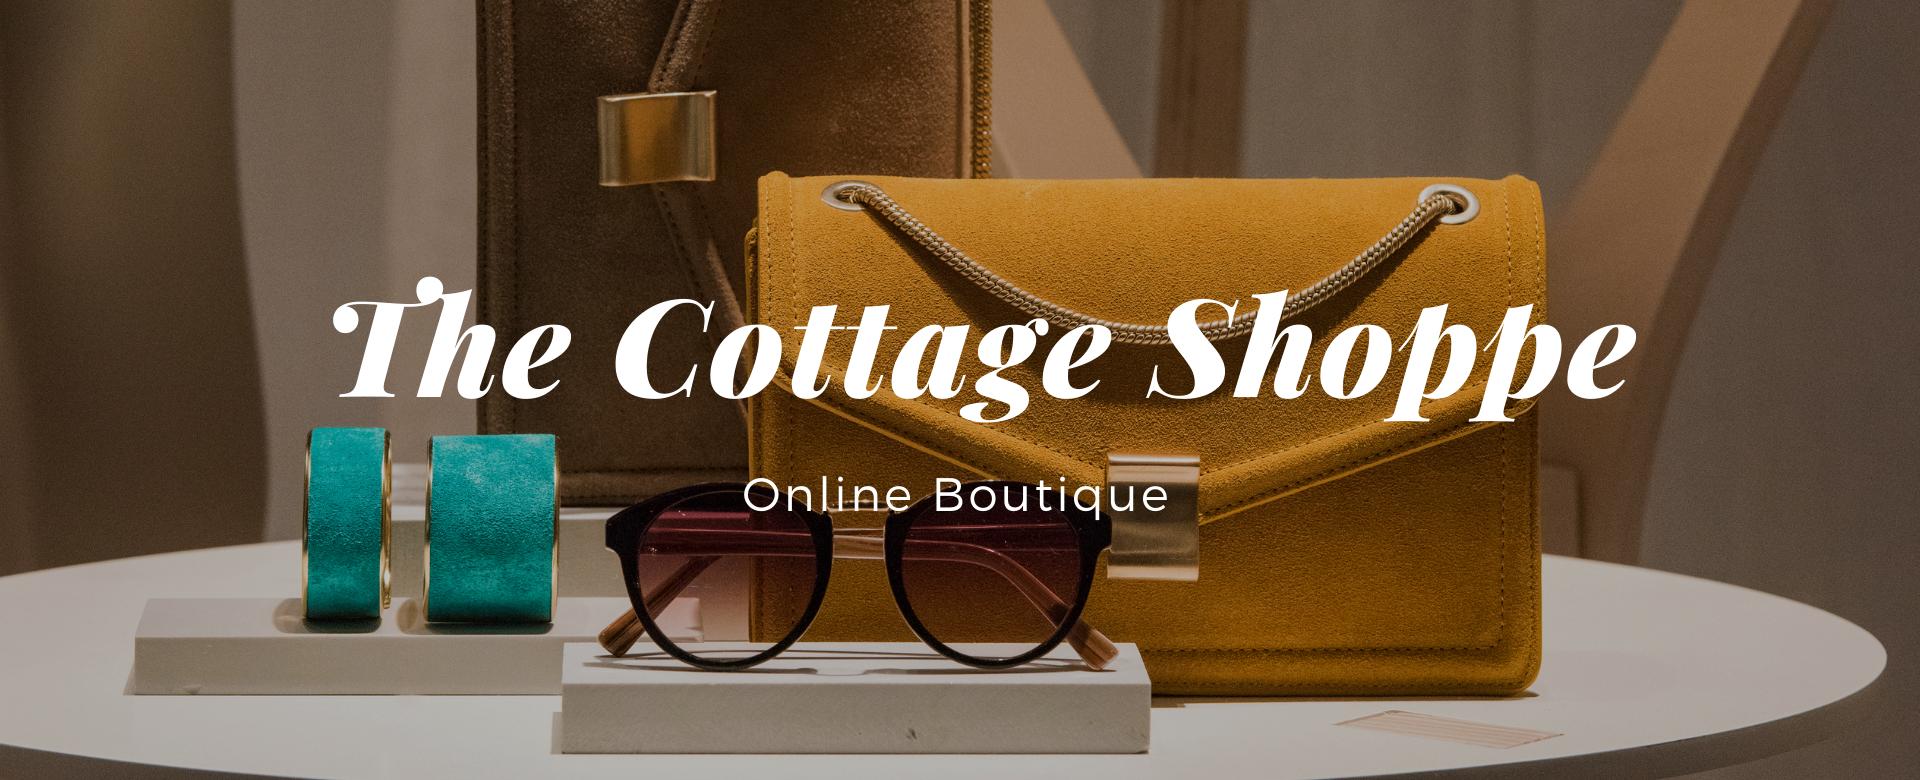 The Cottage Shoppe